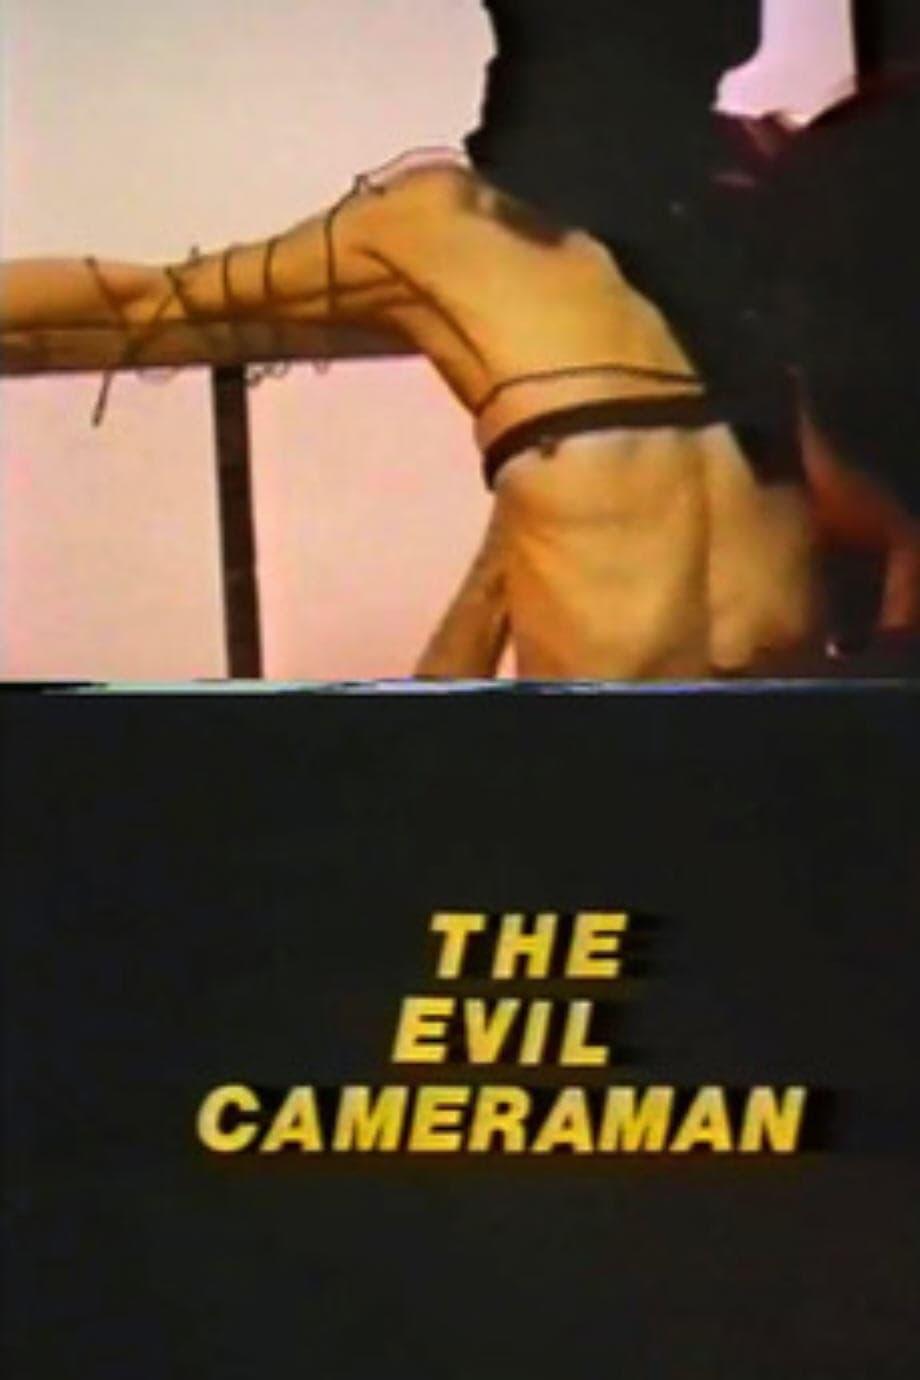 The Evil Cameraman